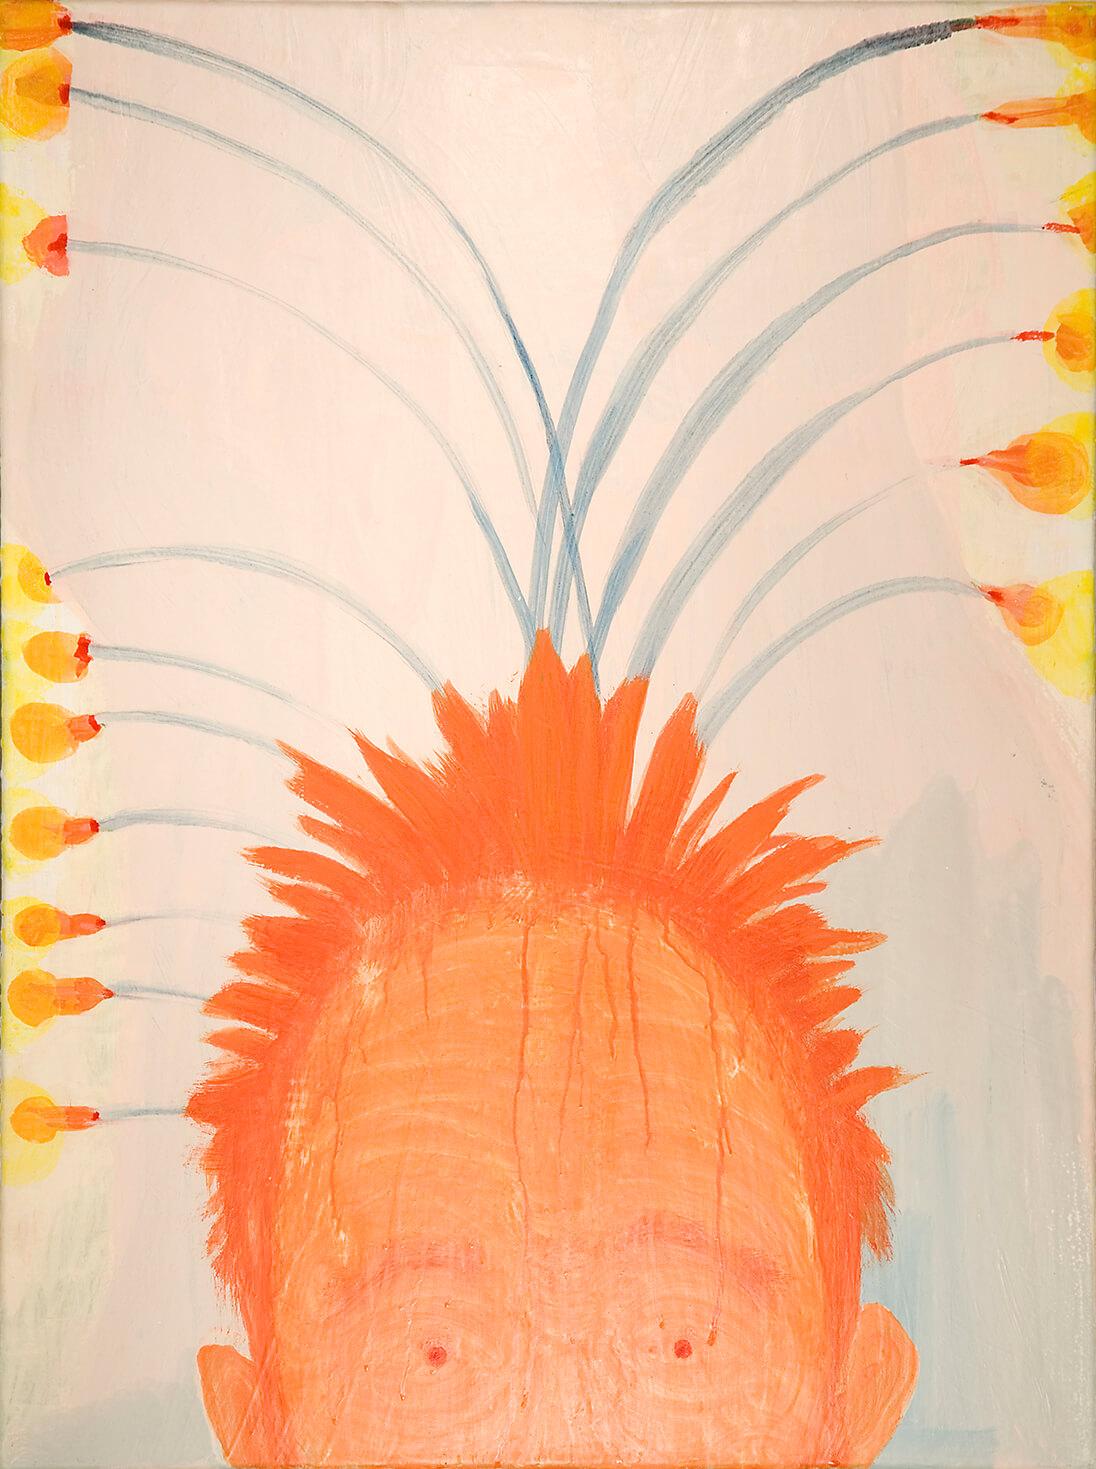 untitled (StanLaurel), 80 x 60 cm, egg tempera on canvas, 2009